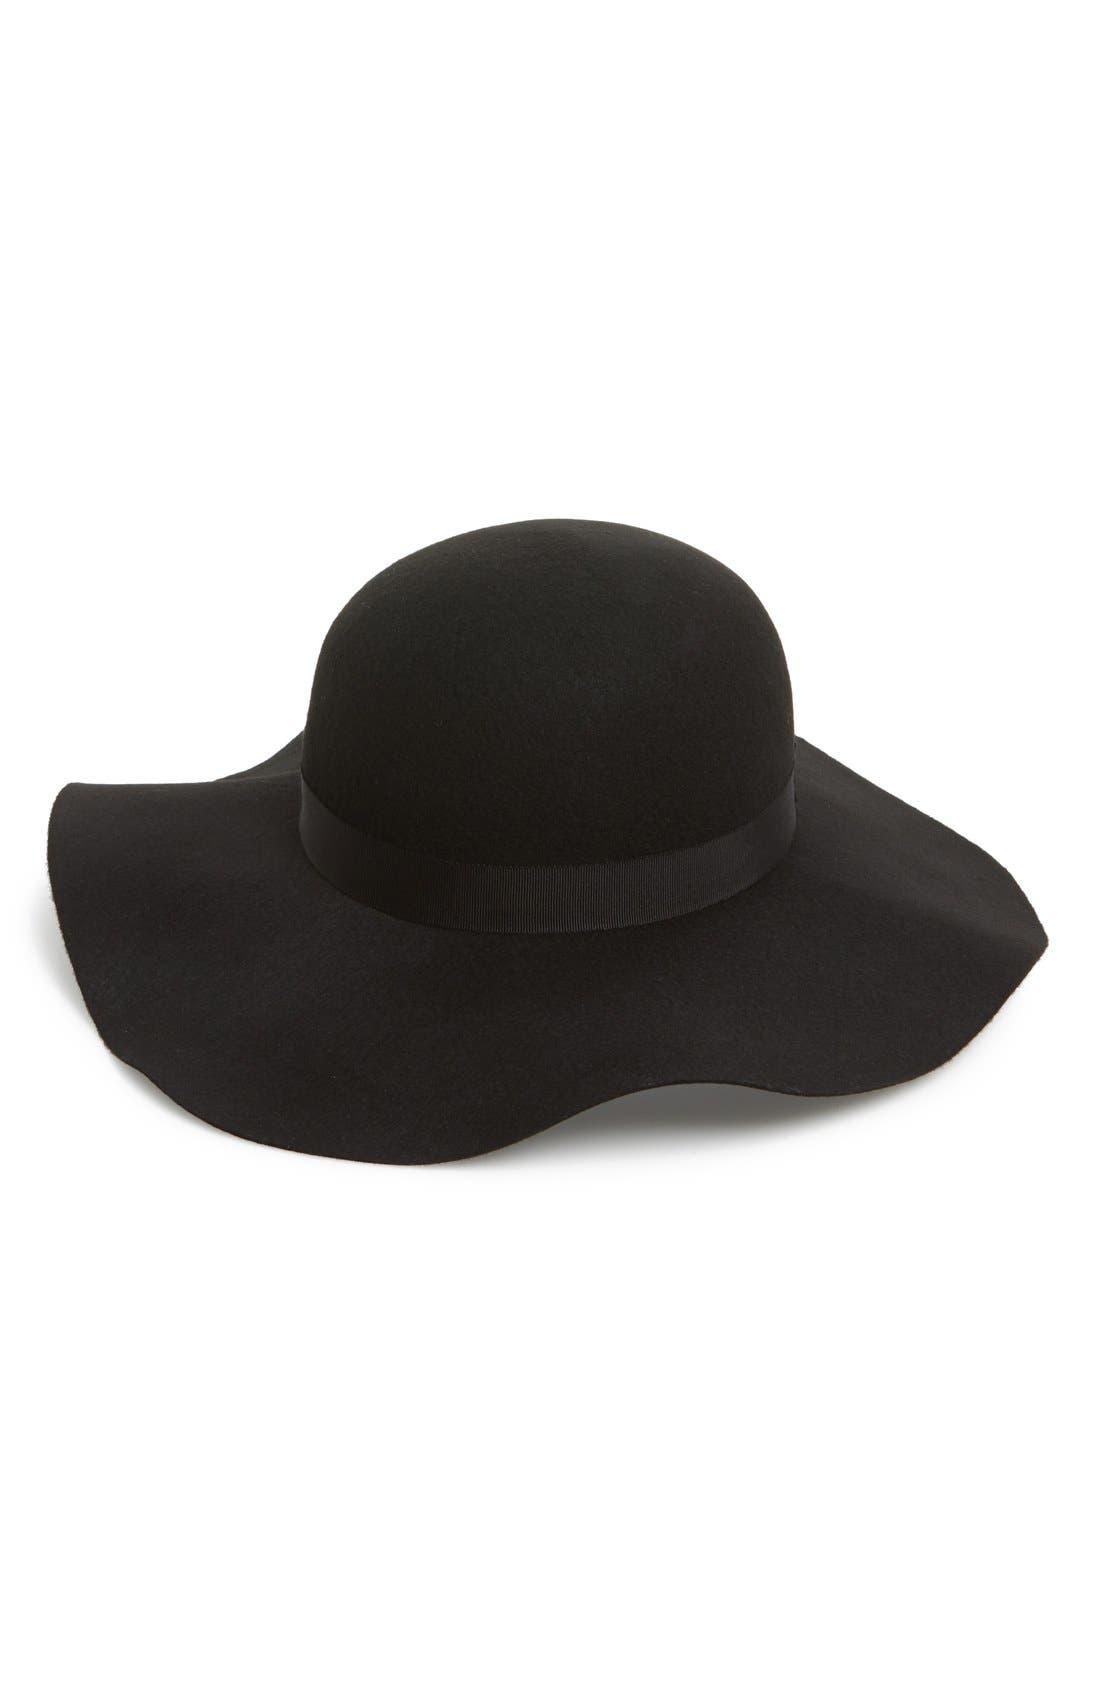 Main Image - Topshop Floppy Felt Hat